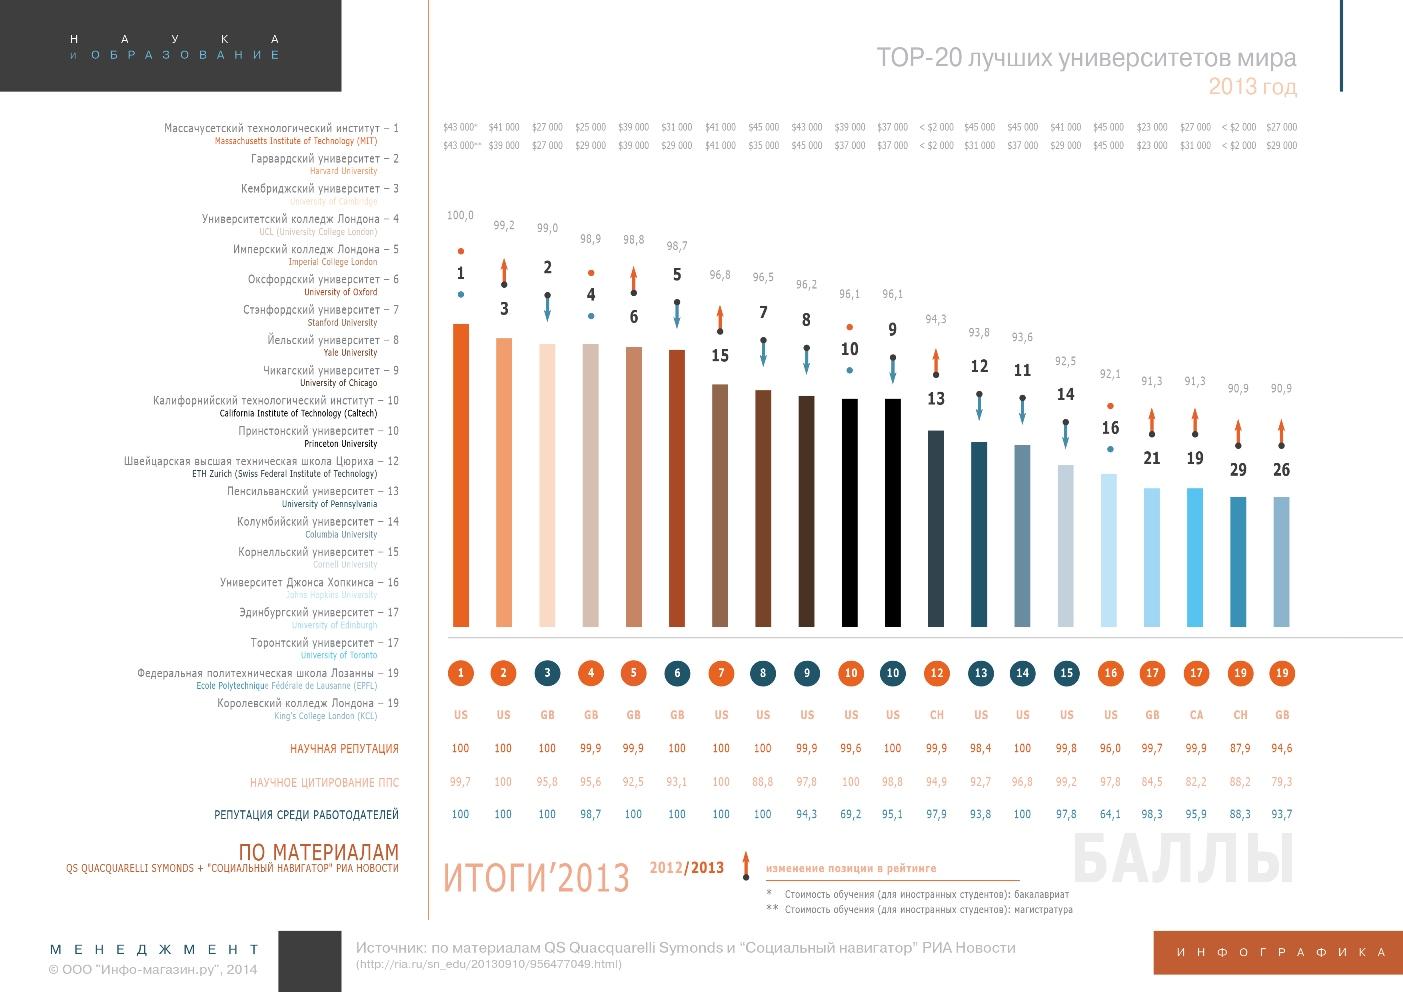 Топ-20 университетов мира